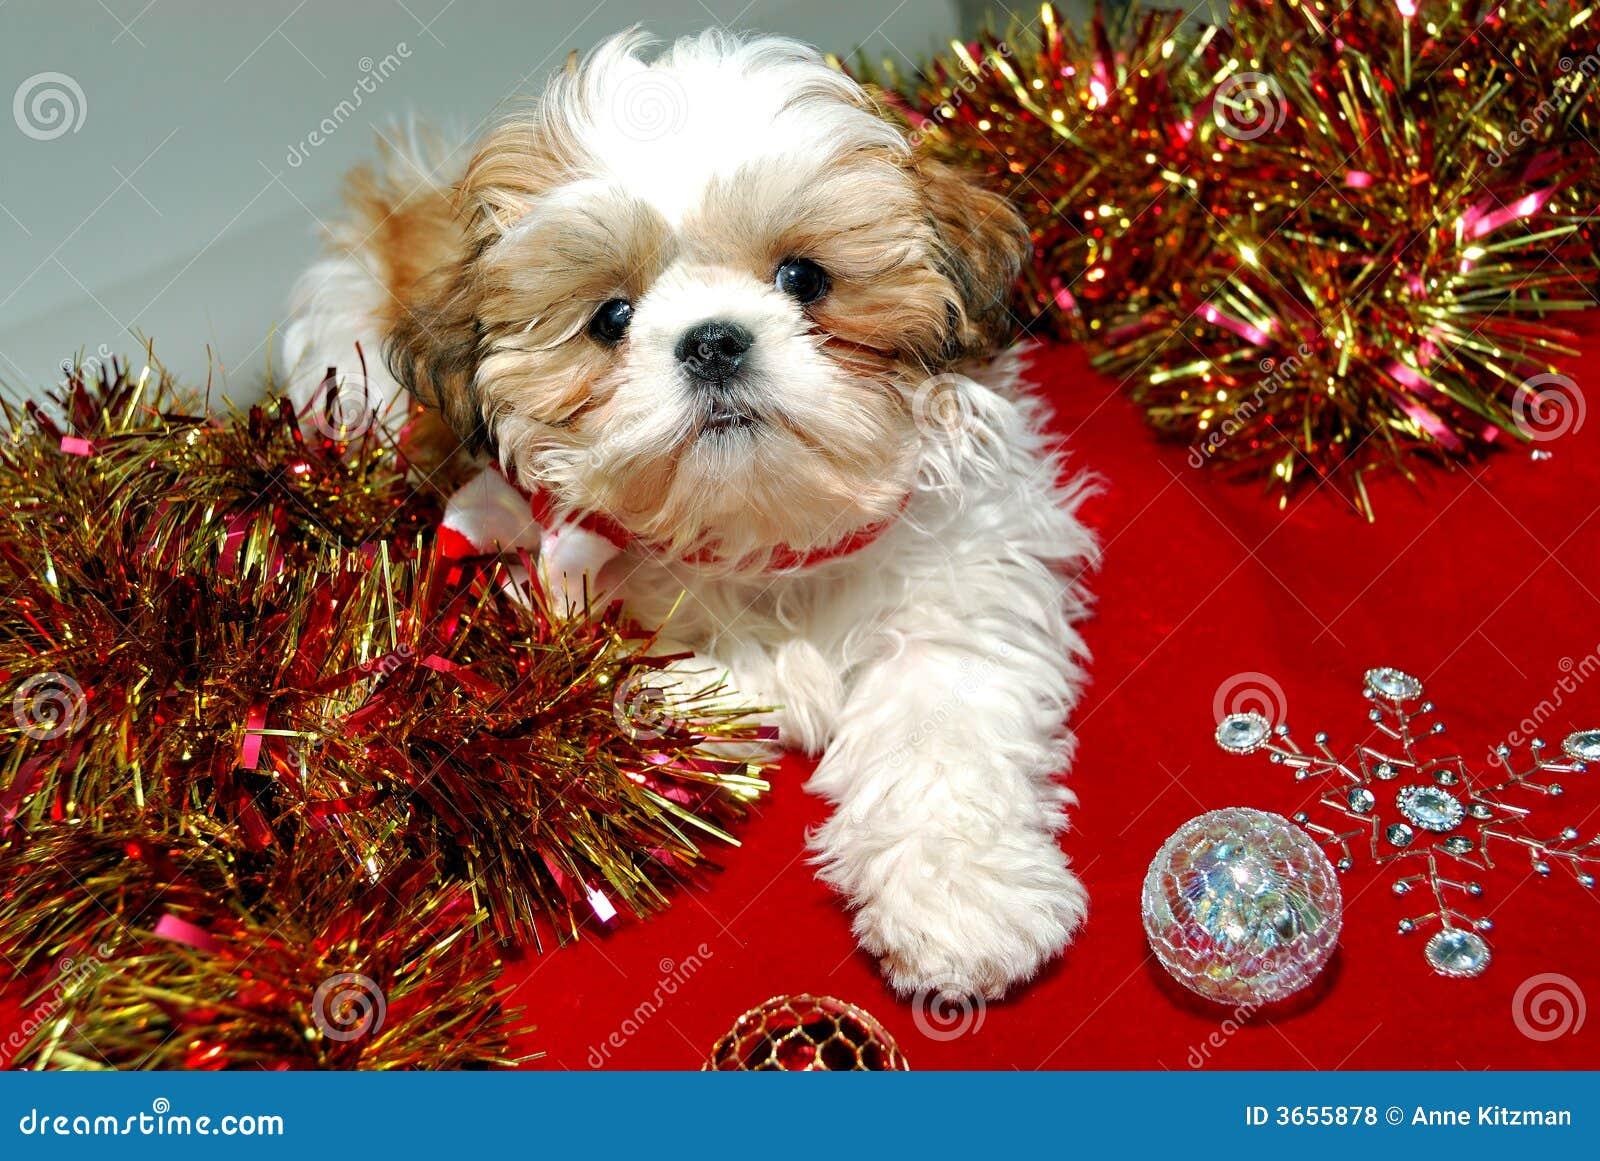 Shih Tzu Christmas Royalty Free Stock Photos - Image: 3655878